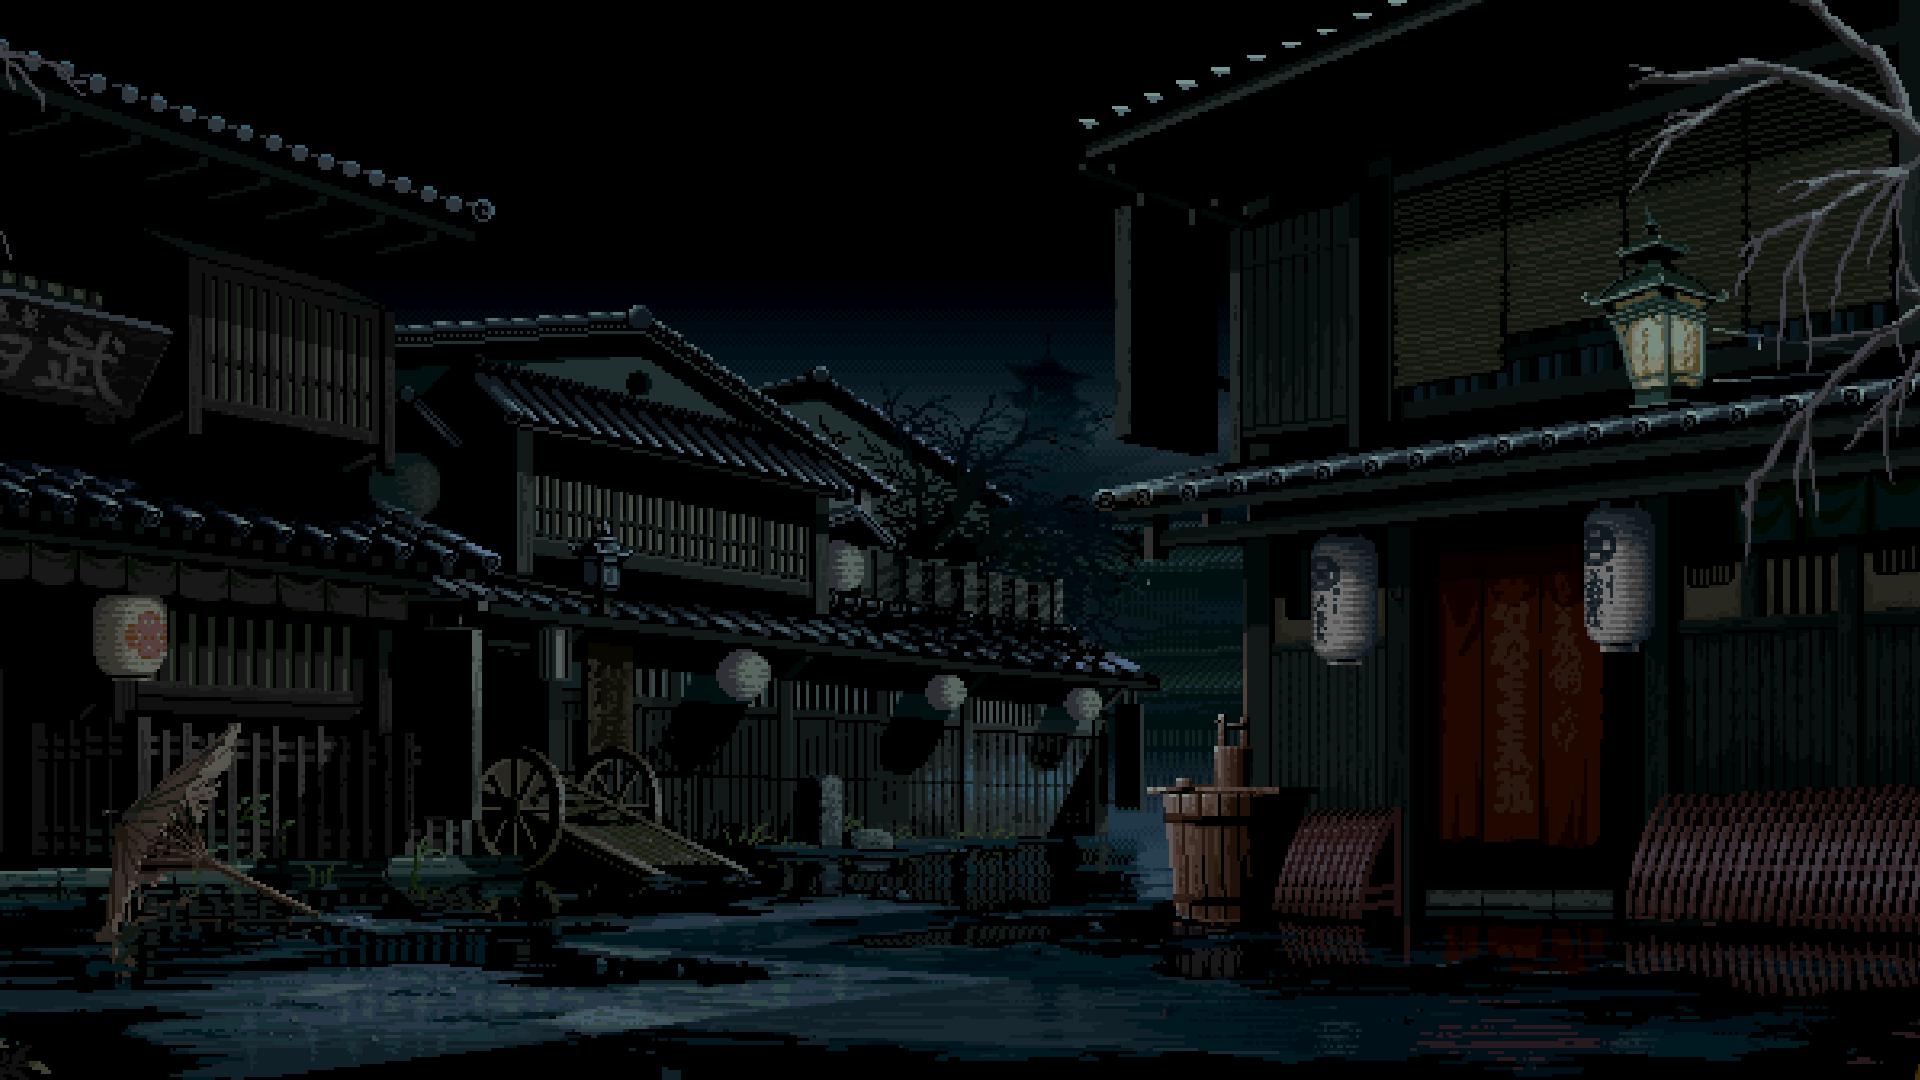 Wallpaper Landscape Digital Art Video Games Street Night